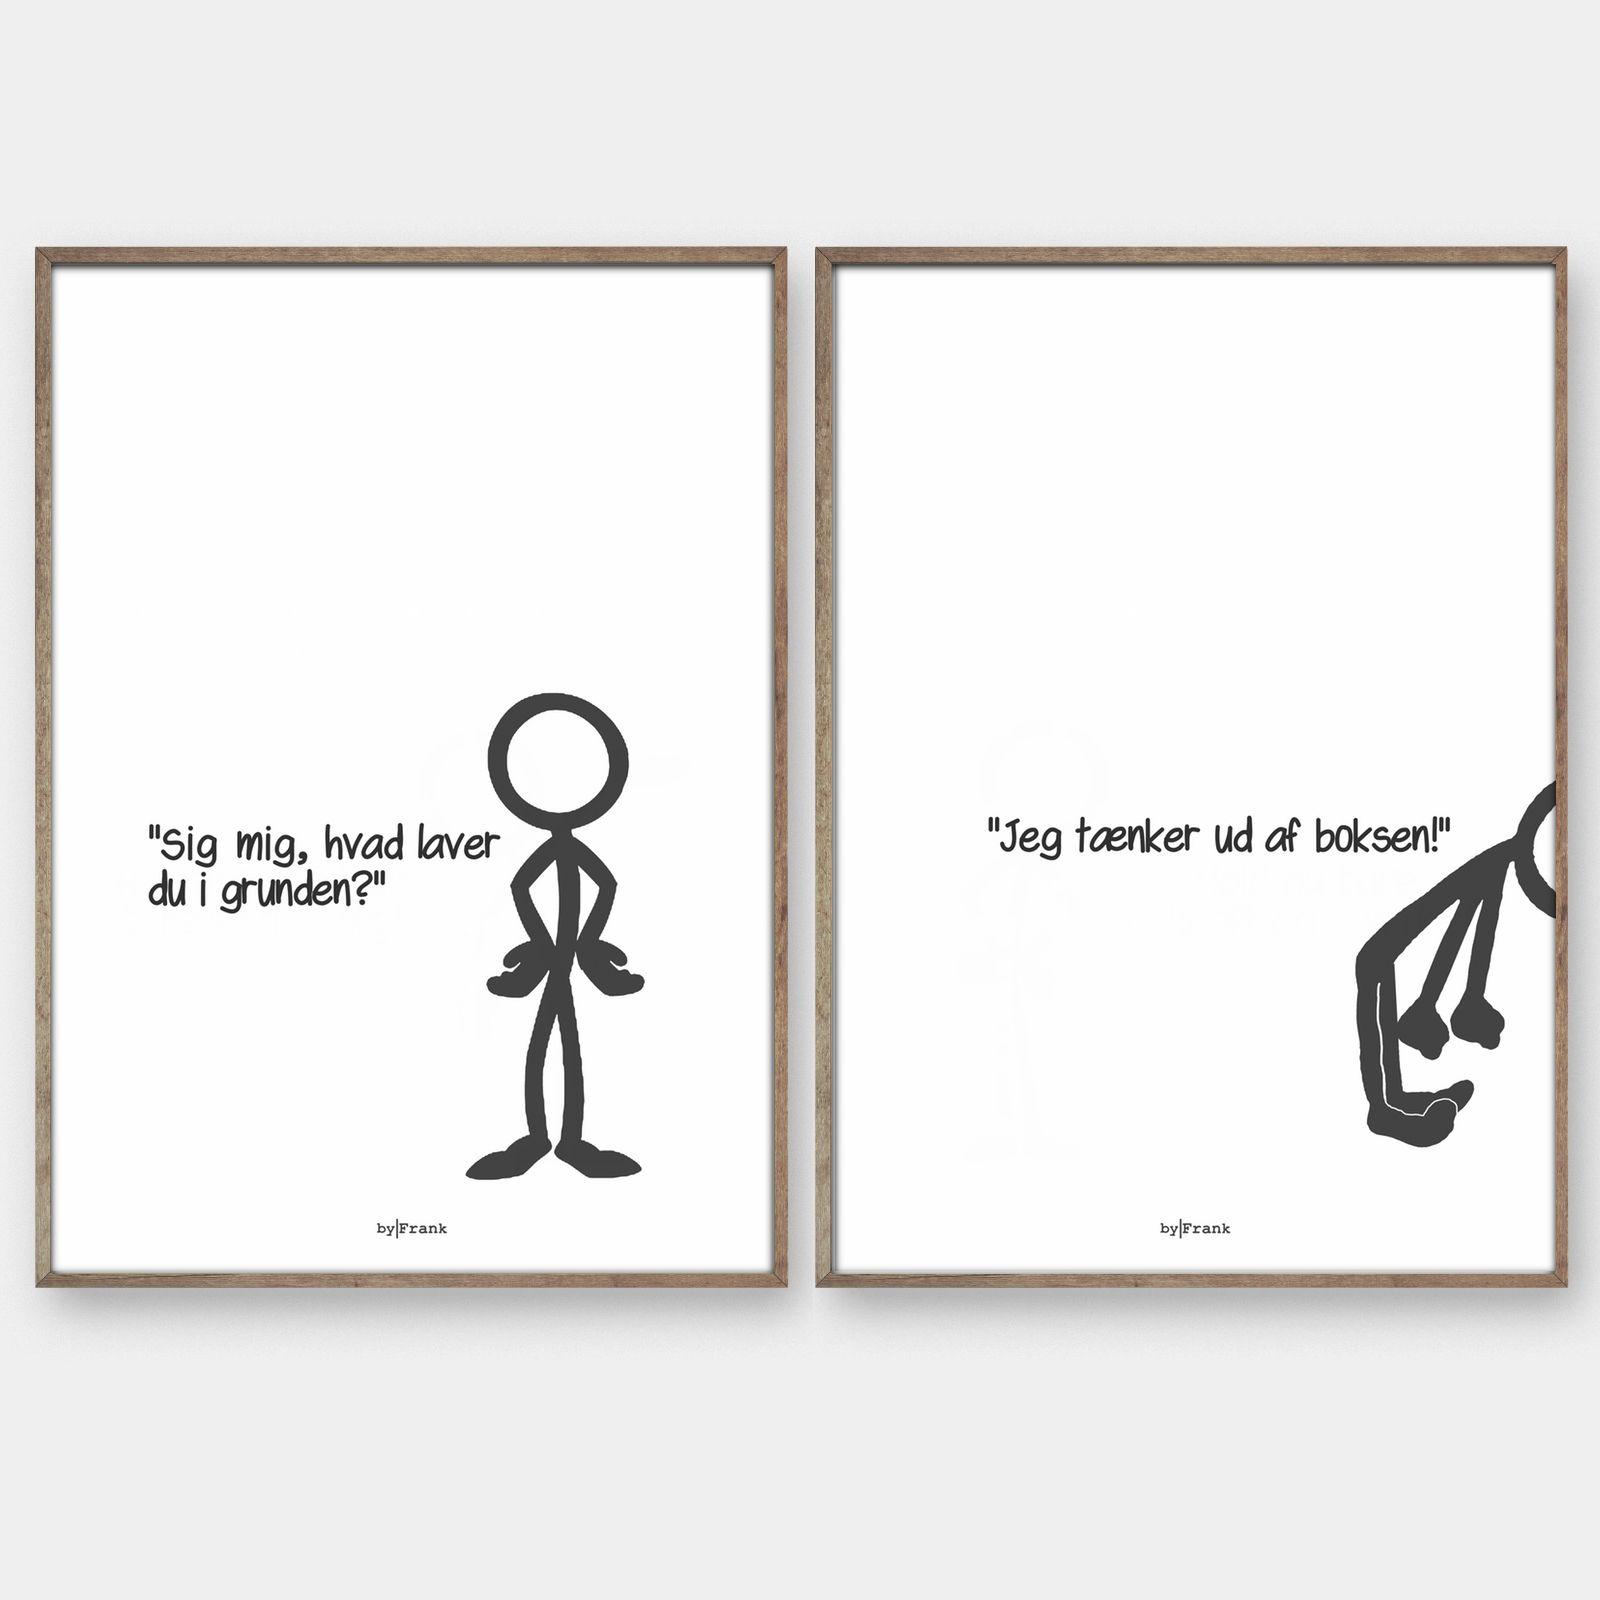 Stickmen Kreativ Plakat Sjoveste Citater Cool Citater Inspirerende Citater